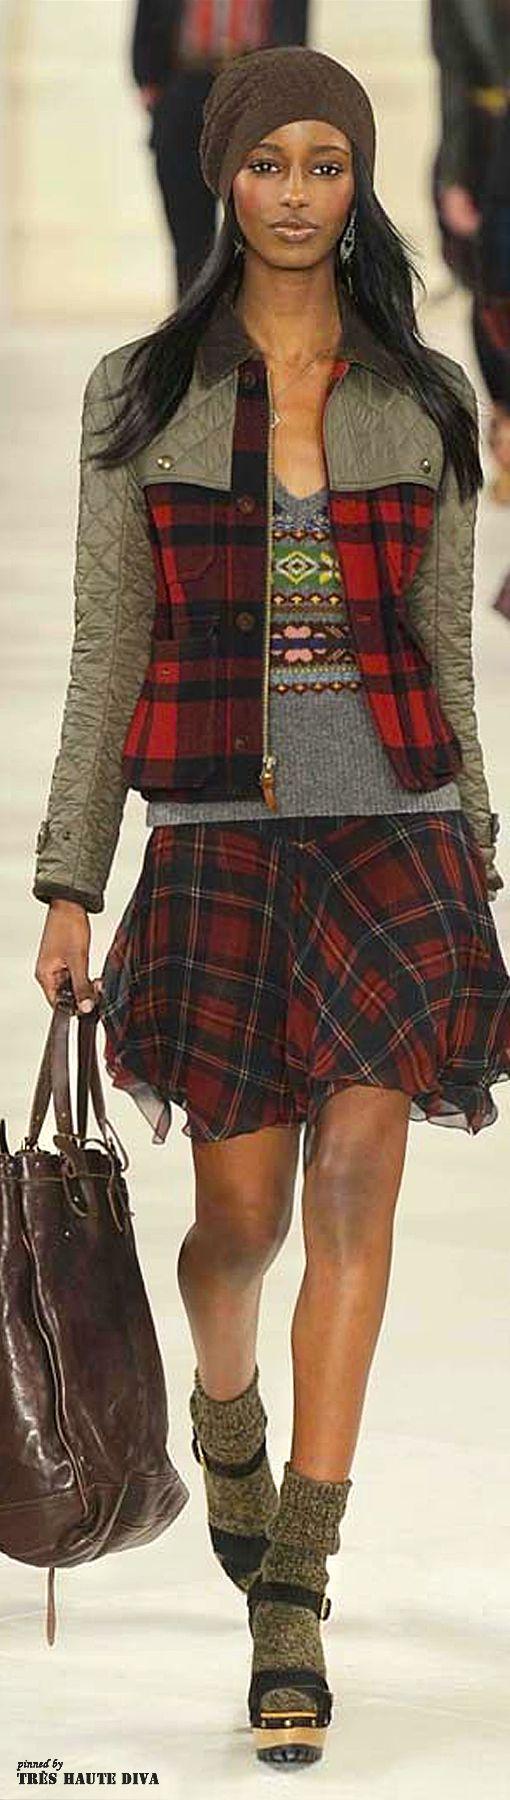 Tartan & grey: Beanie, sweater, warm jacket, light skirt. <3